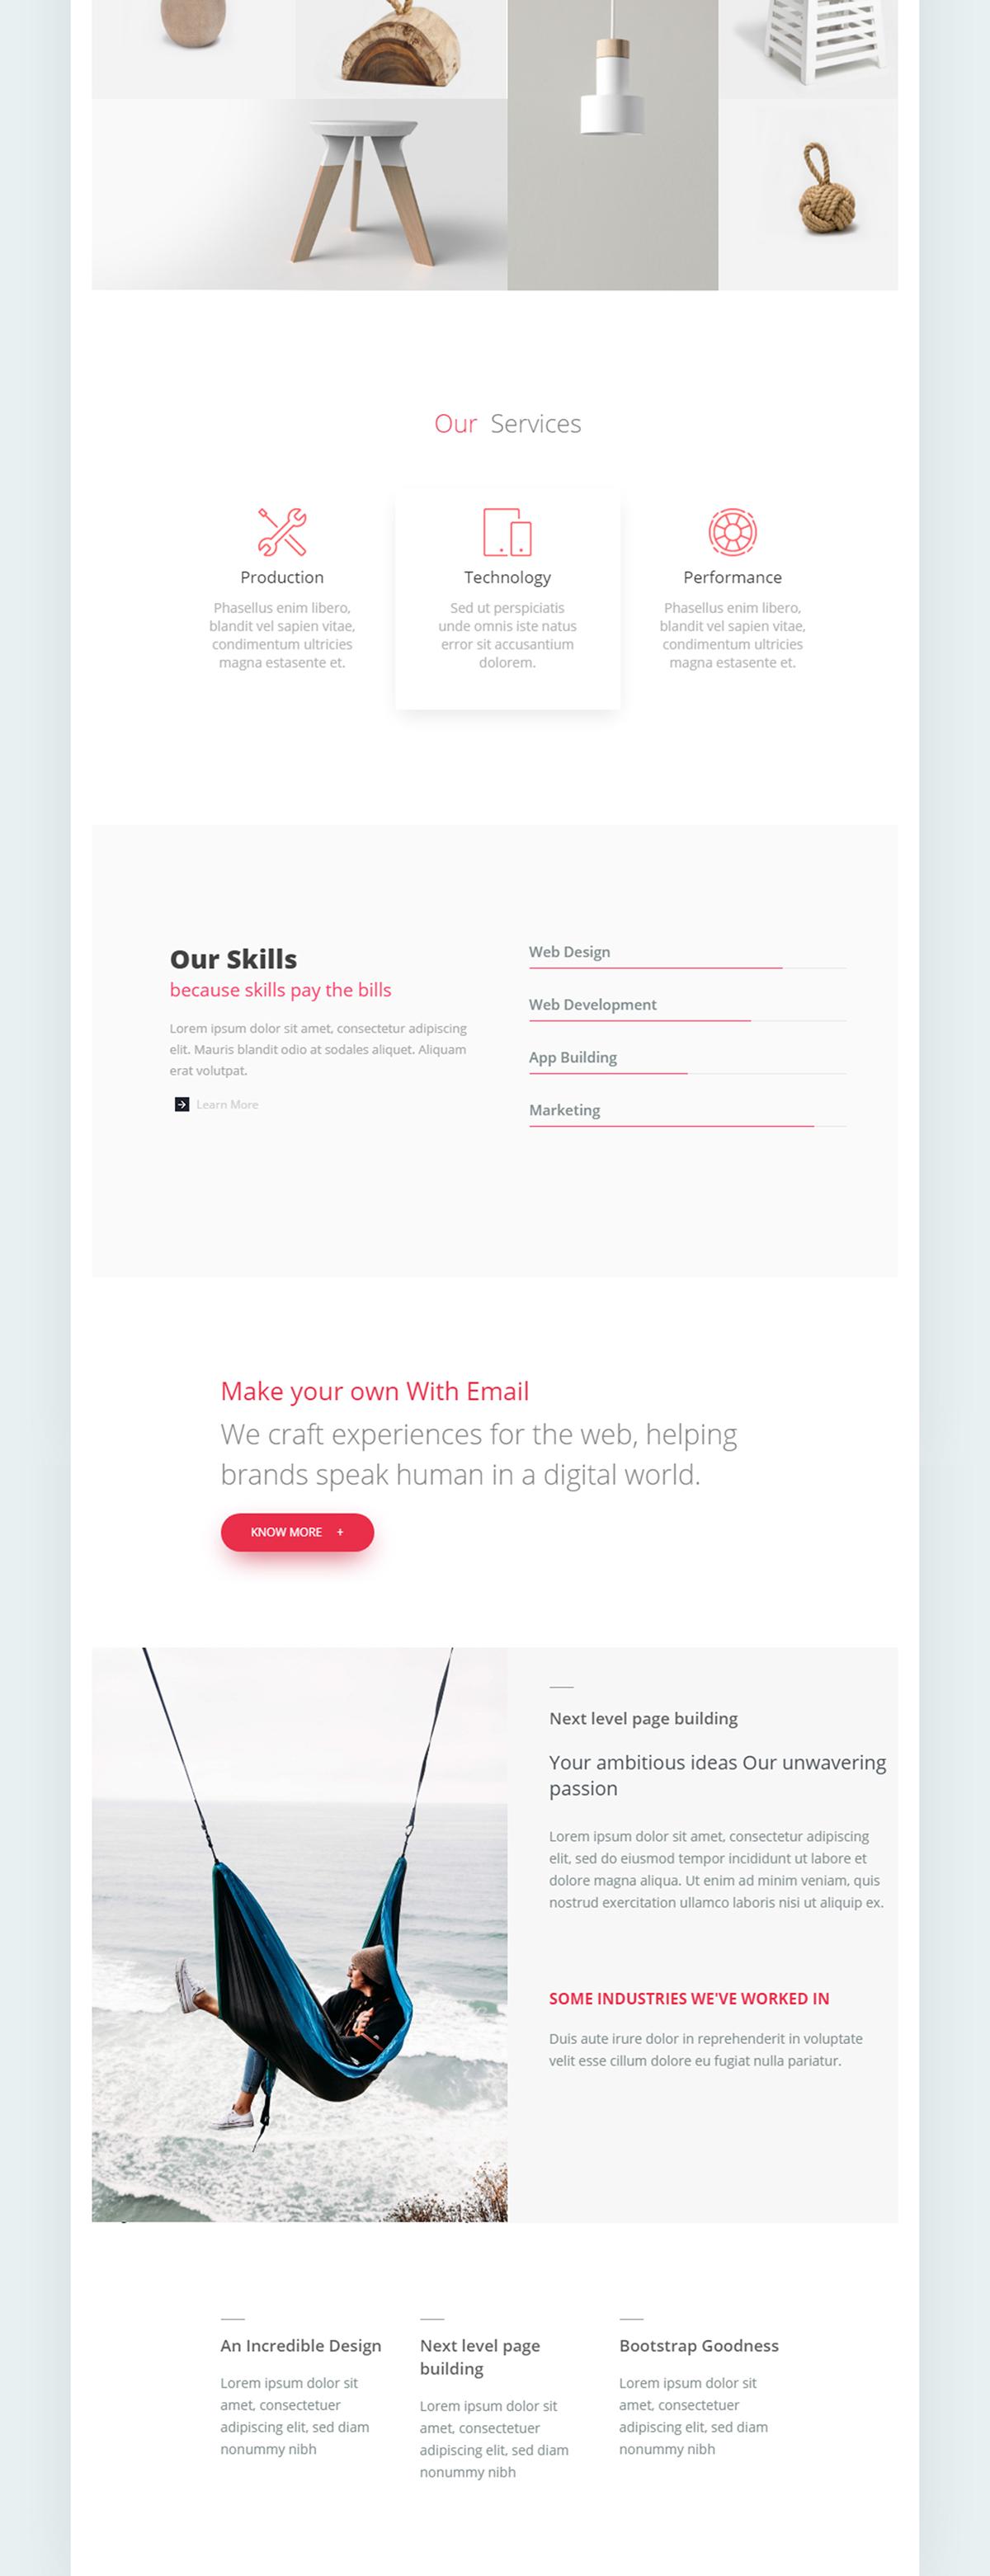 UiX Responsive Email Template Minimal On SVA Portfolios - Minimal email template